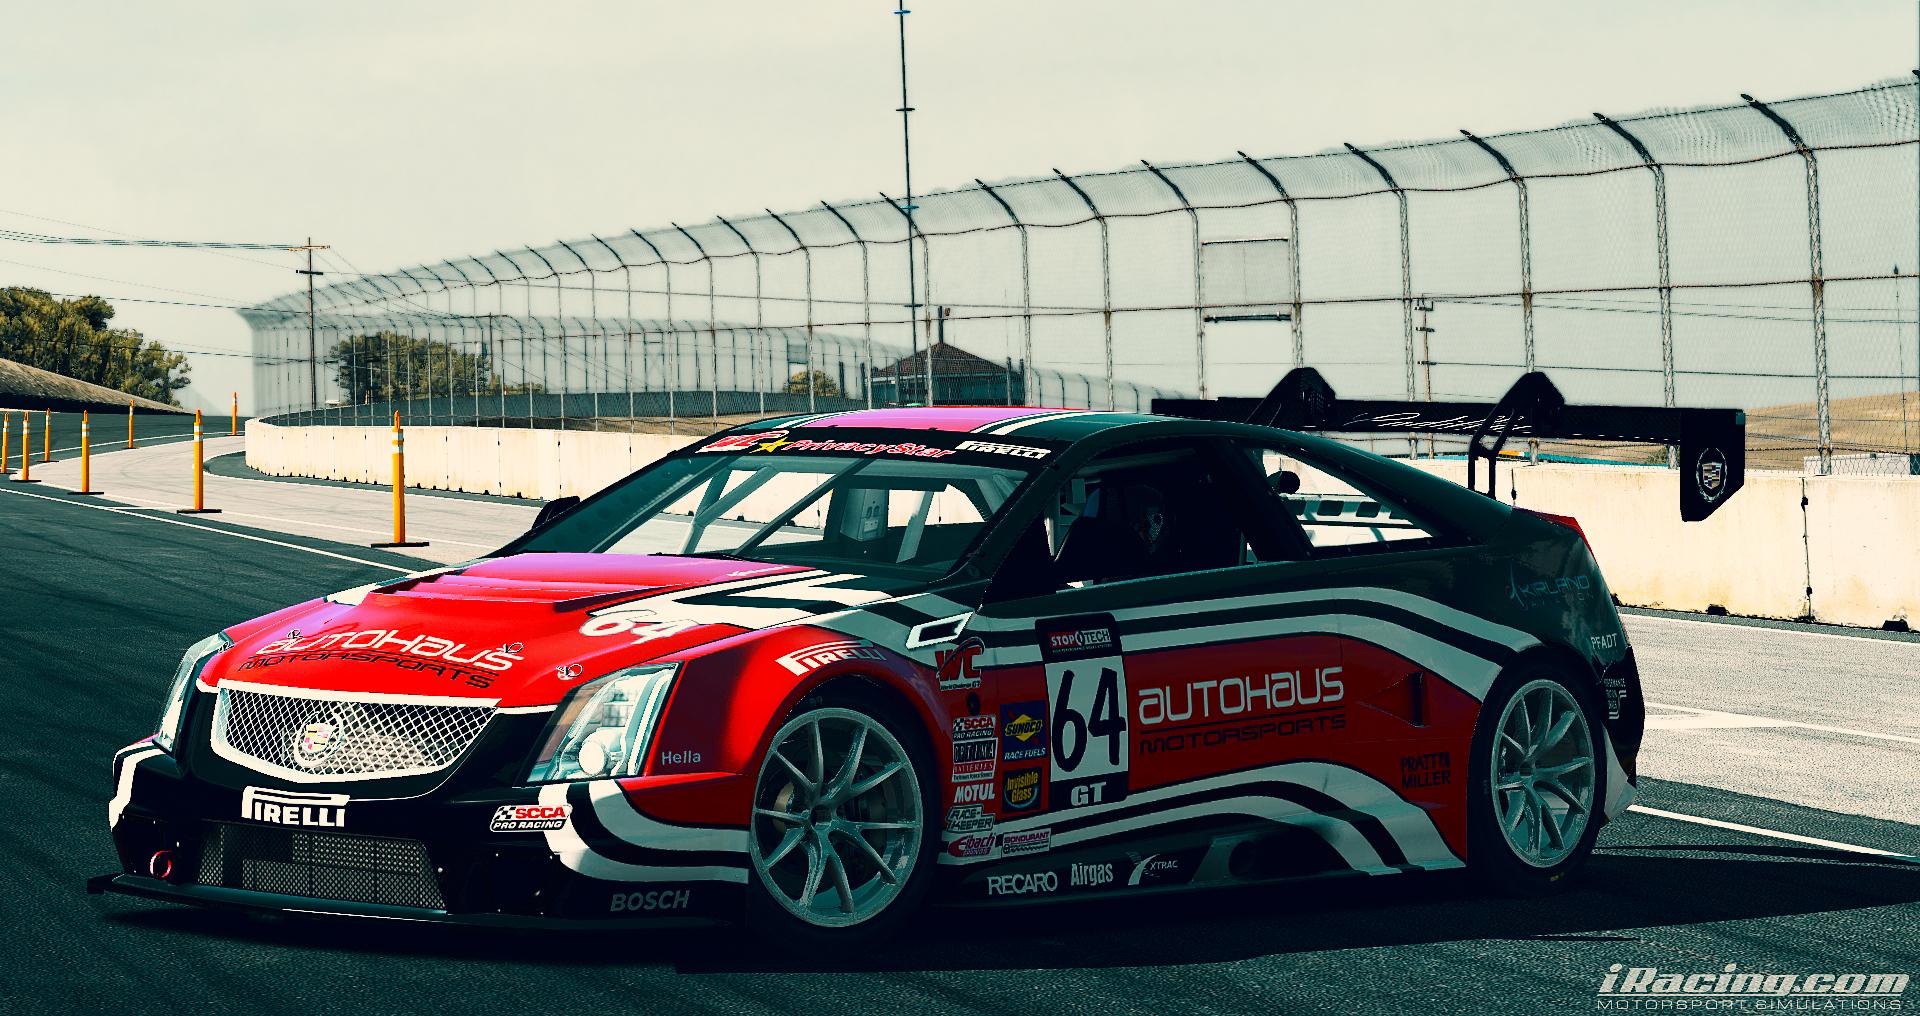 Cadillac CTS-V Racecar @ Laguna Seca [EDITED]